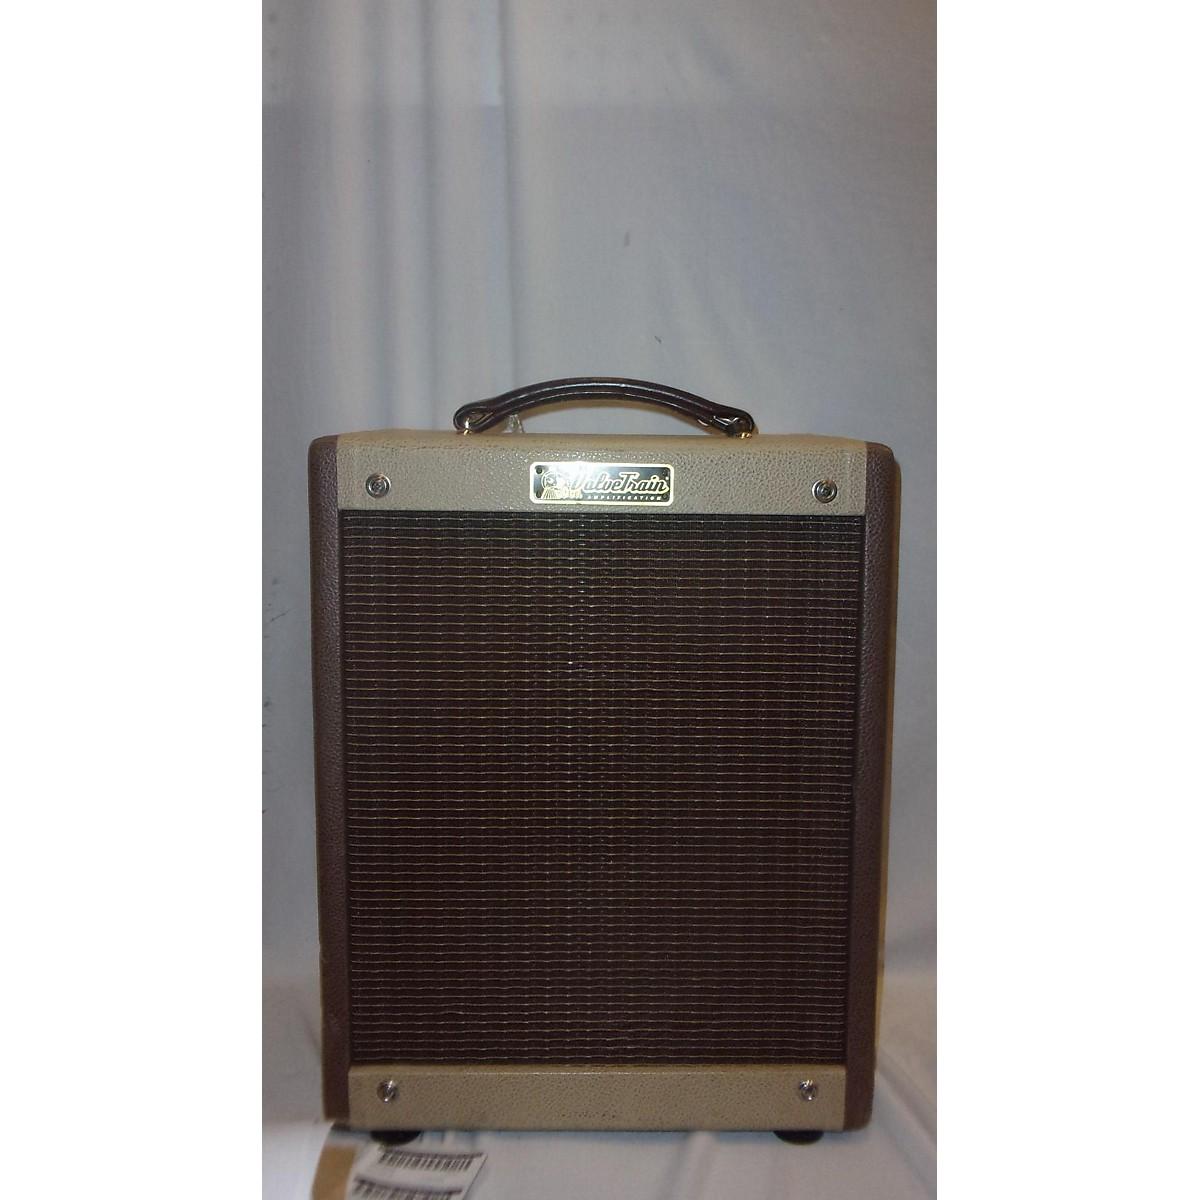 ValveTrain 205 Tall Boy Guitar Power Amp